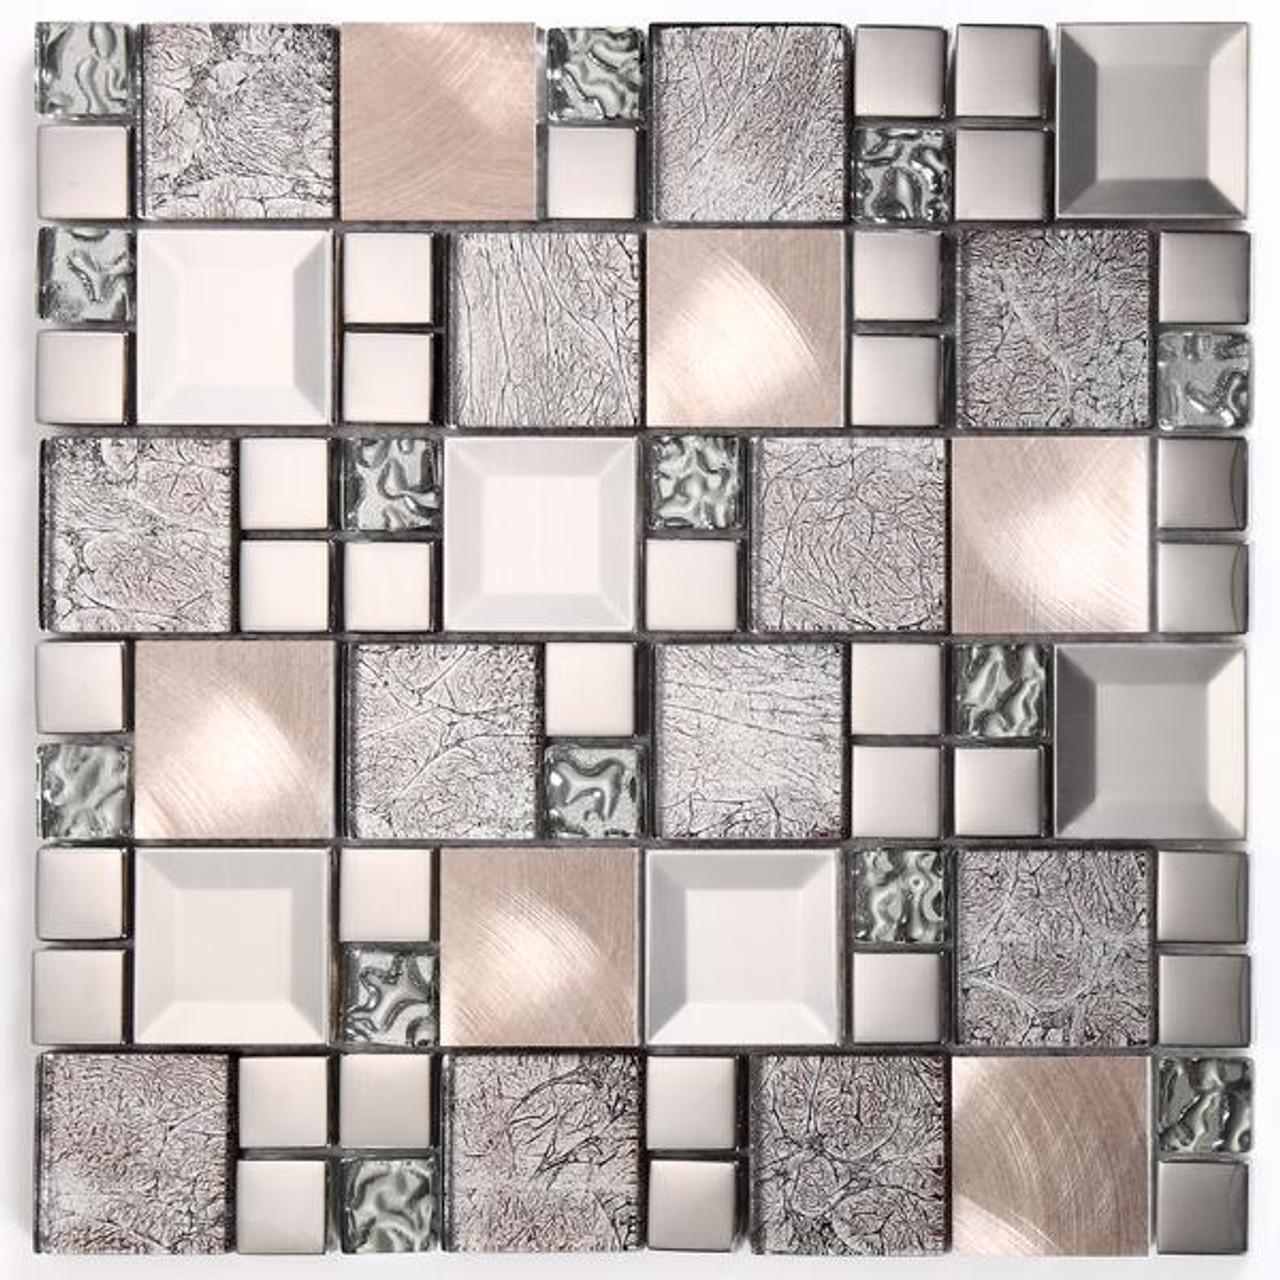 kaos silver glass mosaic